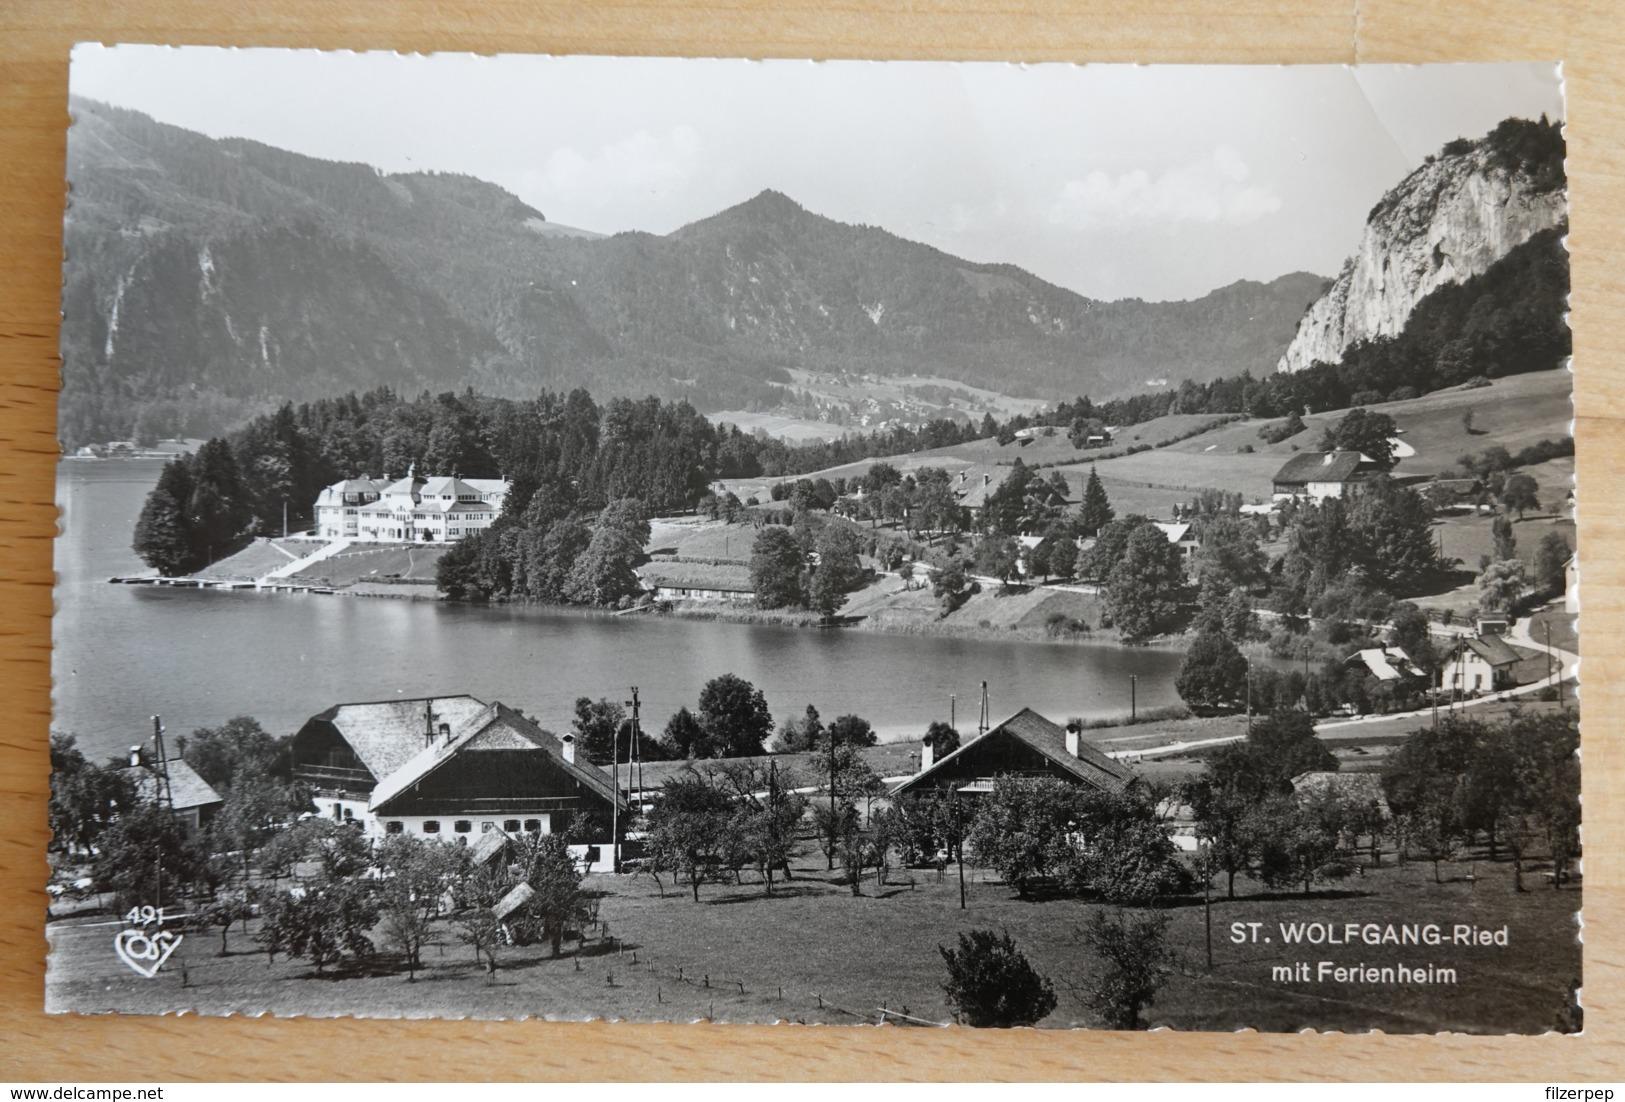 St. Wolfgang Ried Ferienheim - St. Wolfgang